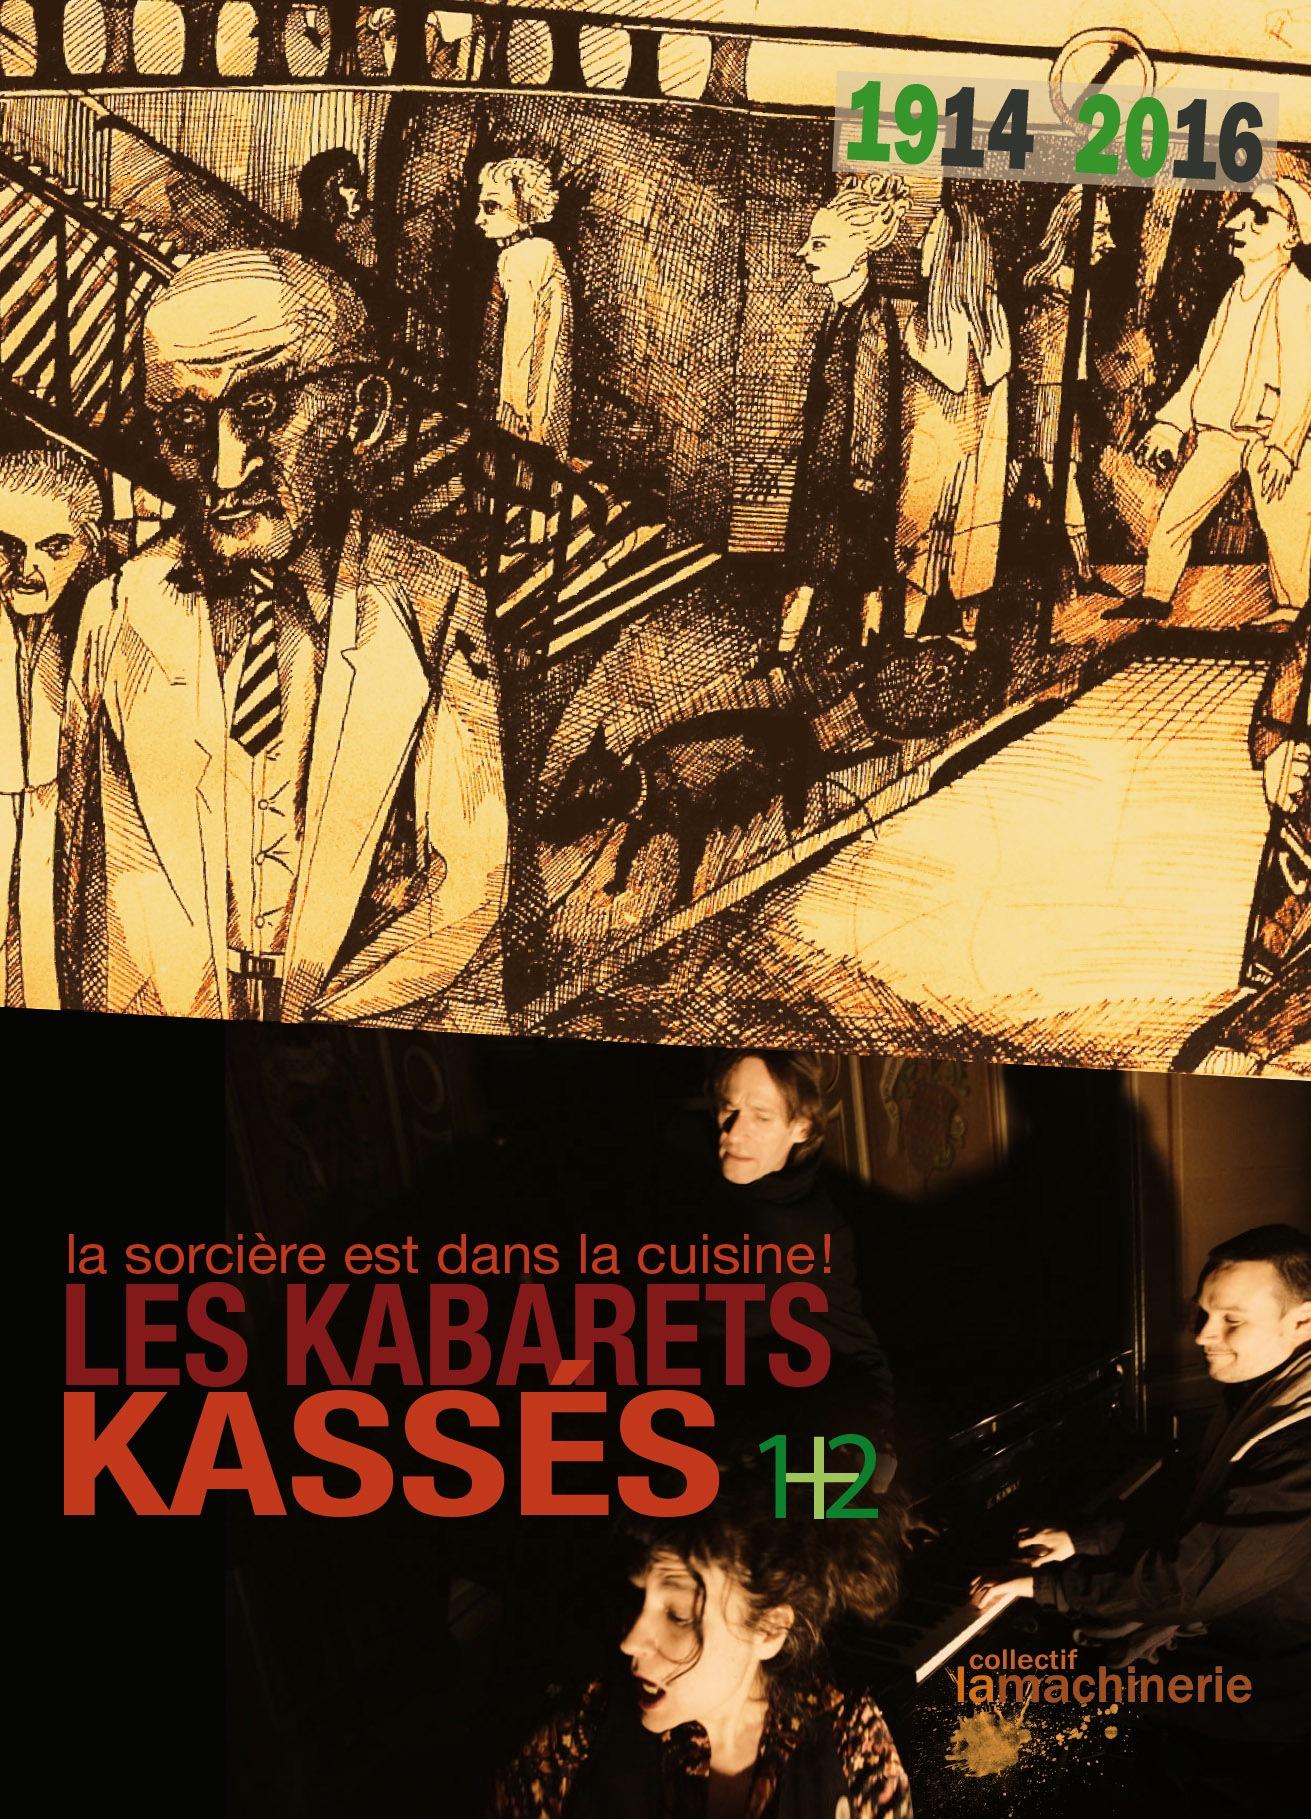 Les Kabarets Kassés 1 + 2